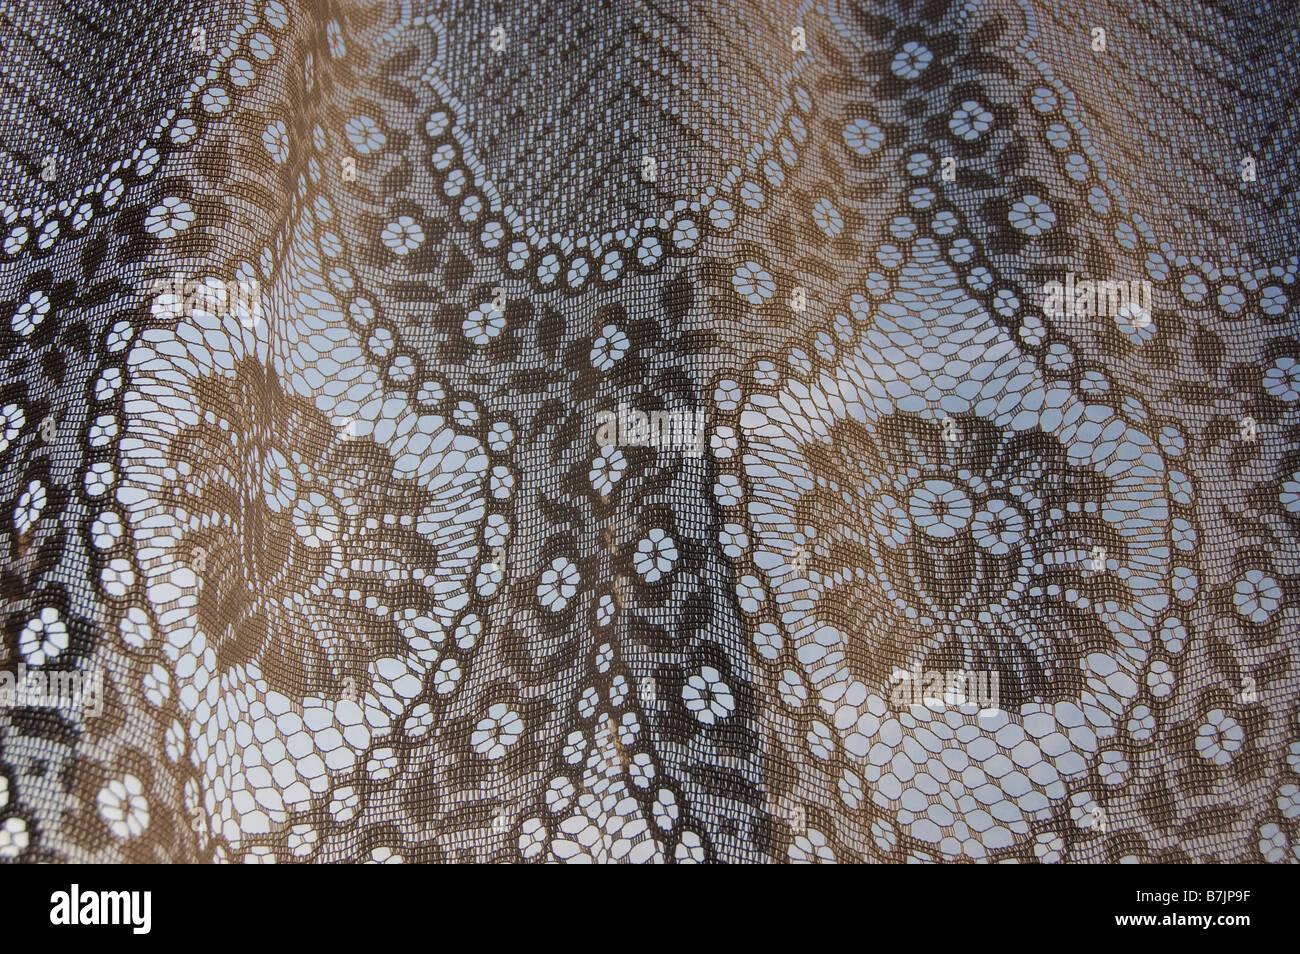 Net curtain - Stock Image